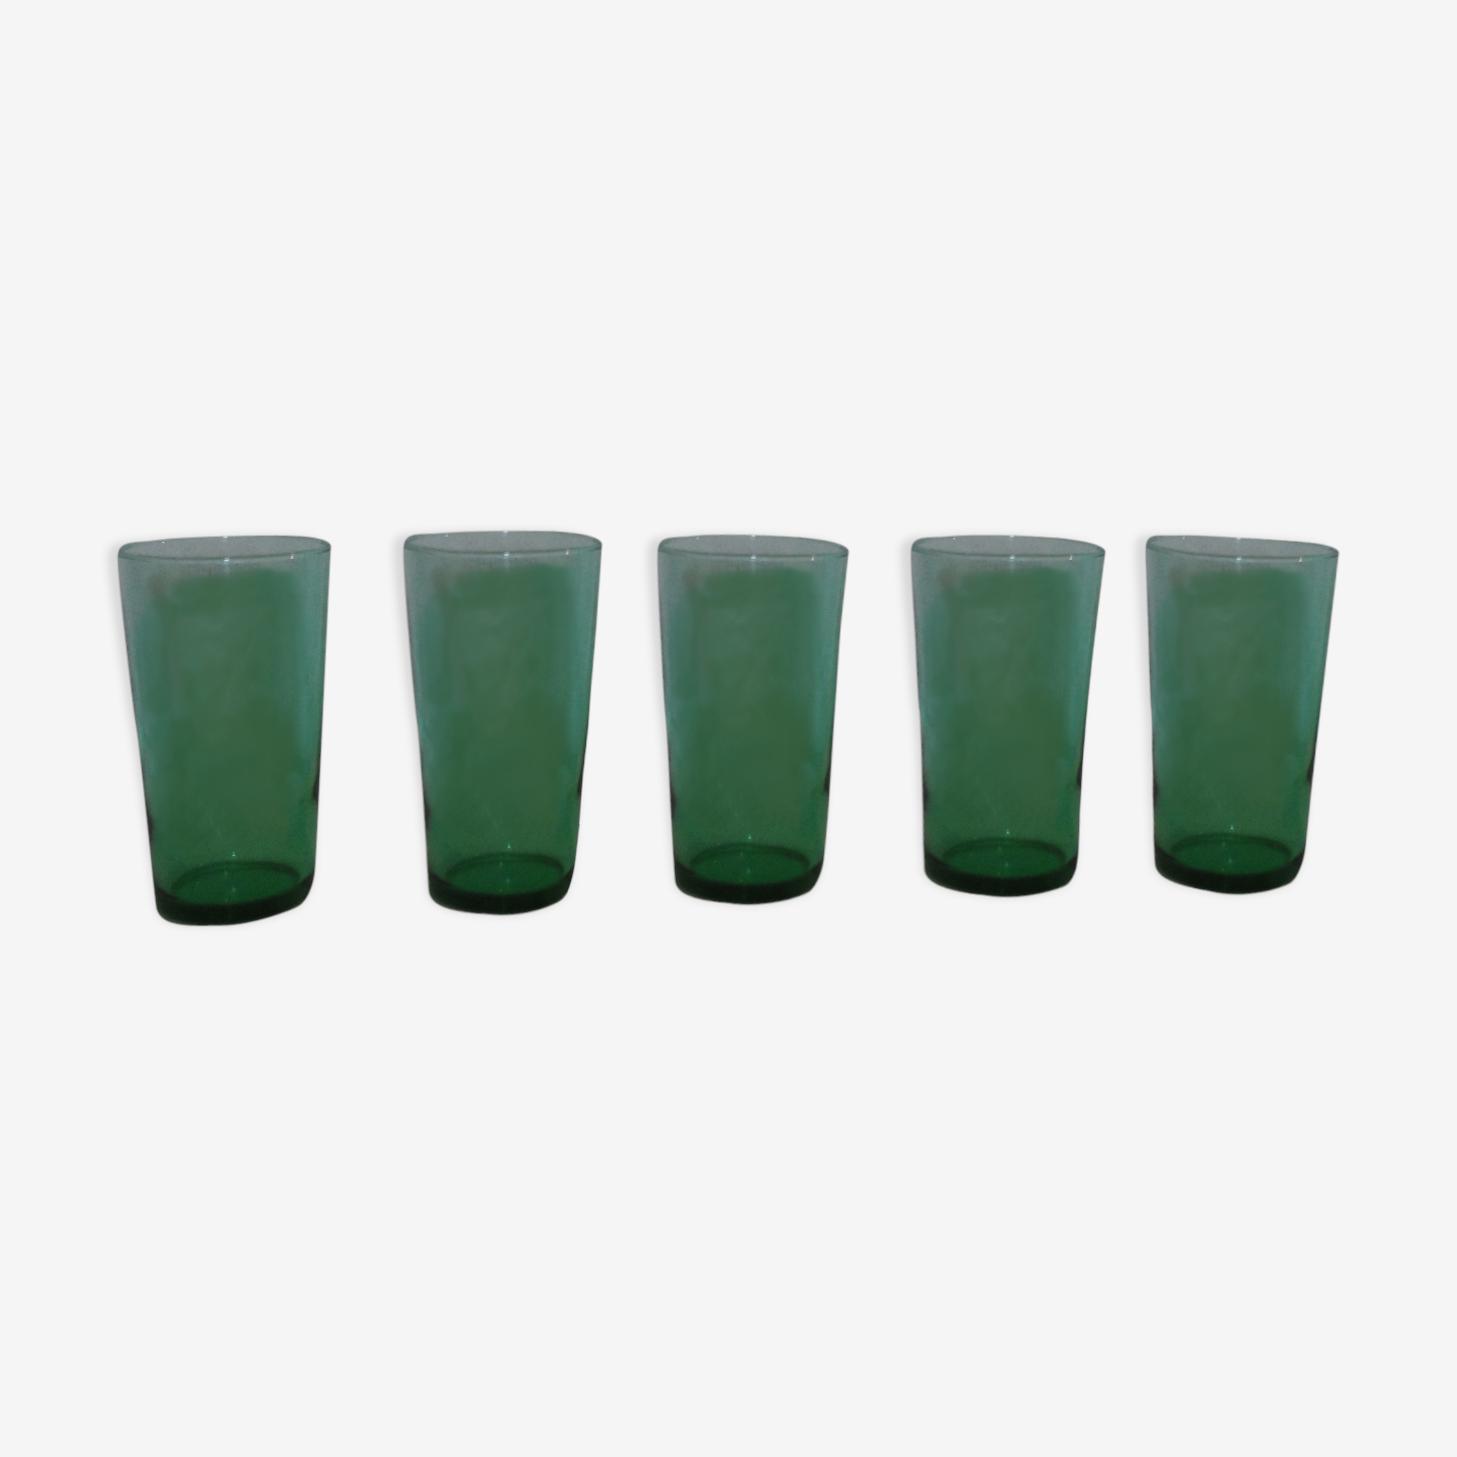 Set de 5 Green lemonade glass